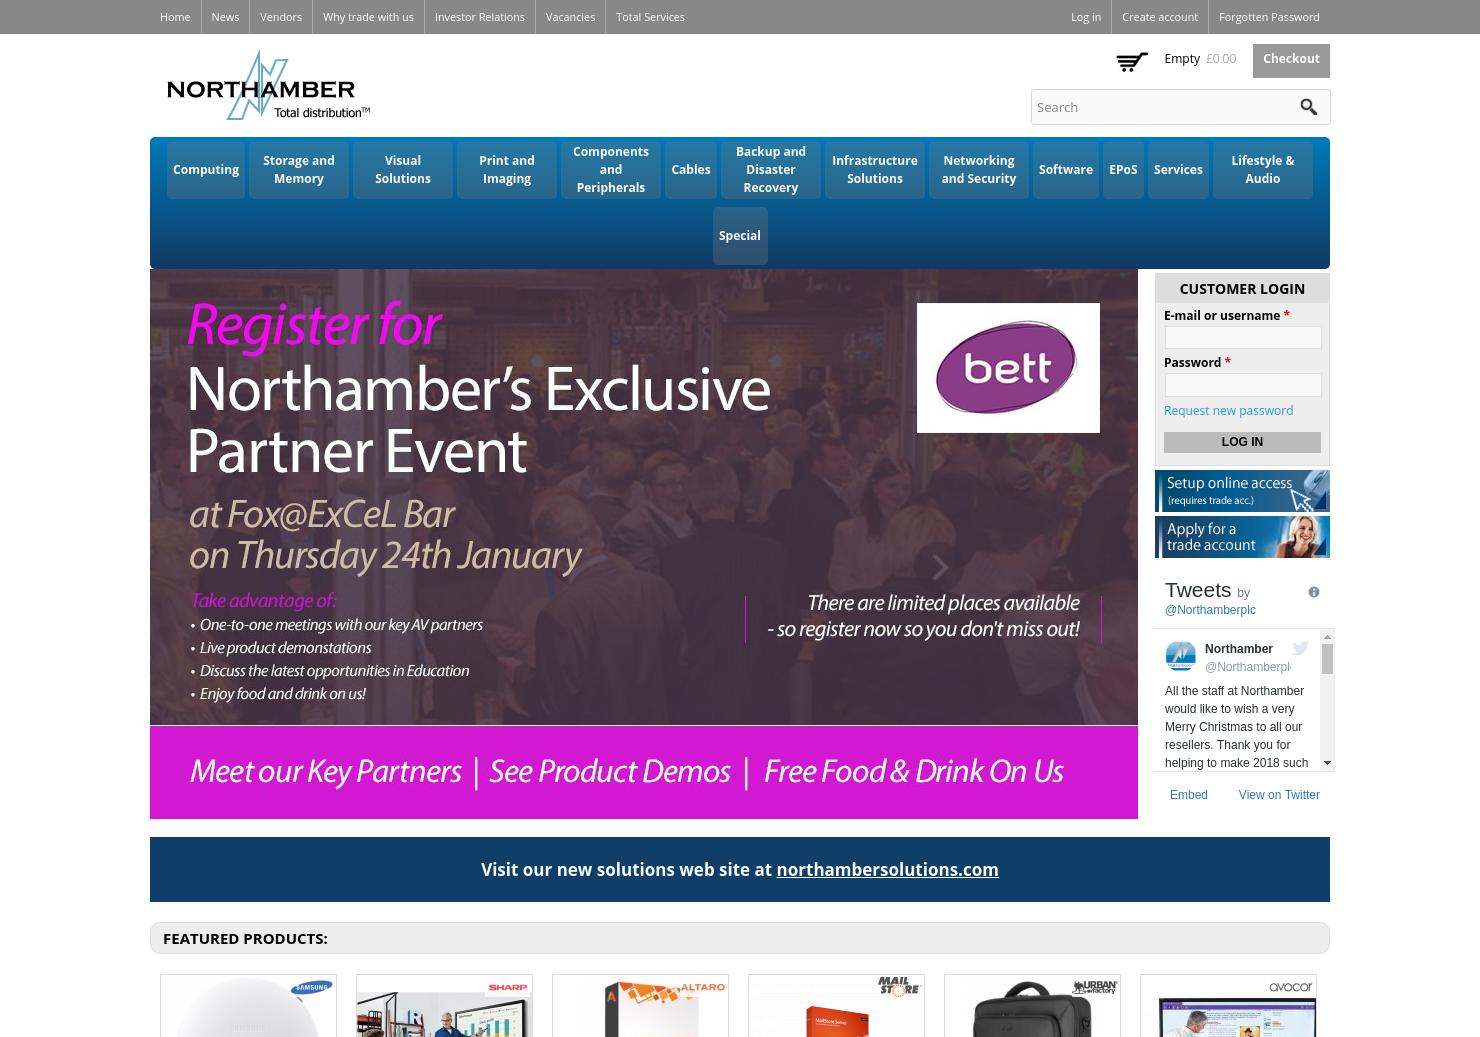 Northamber Home Page